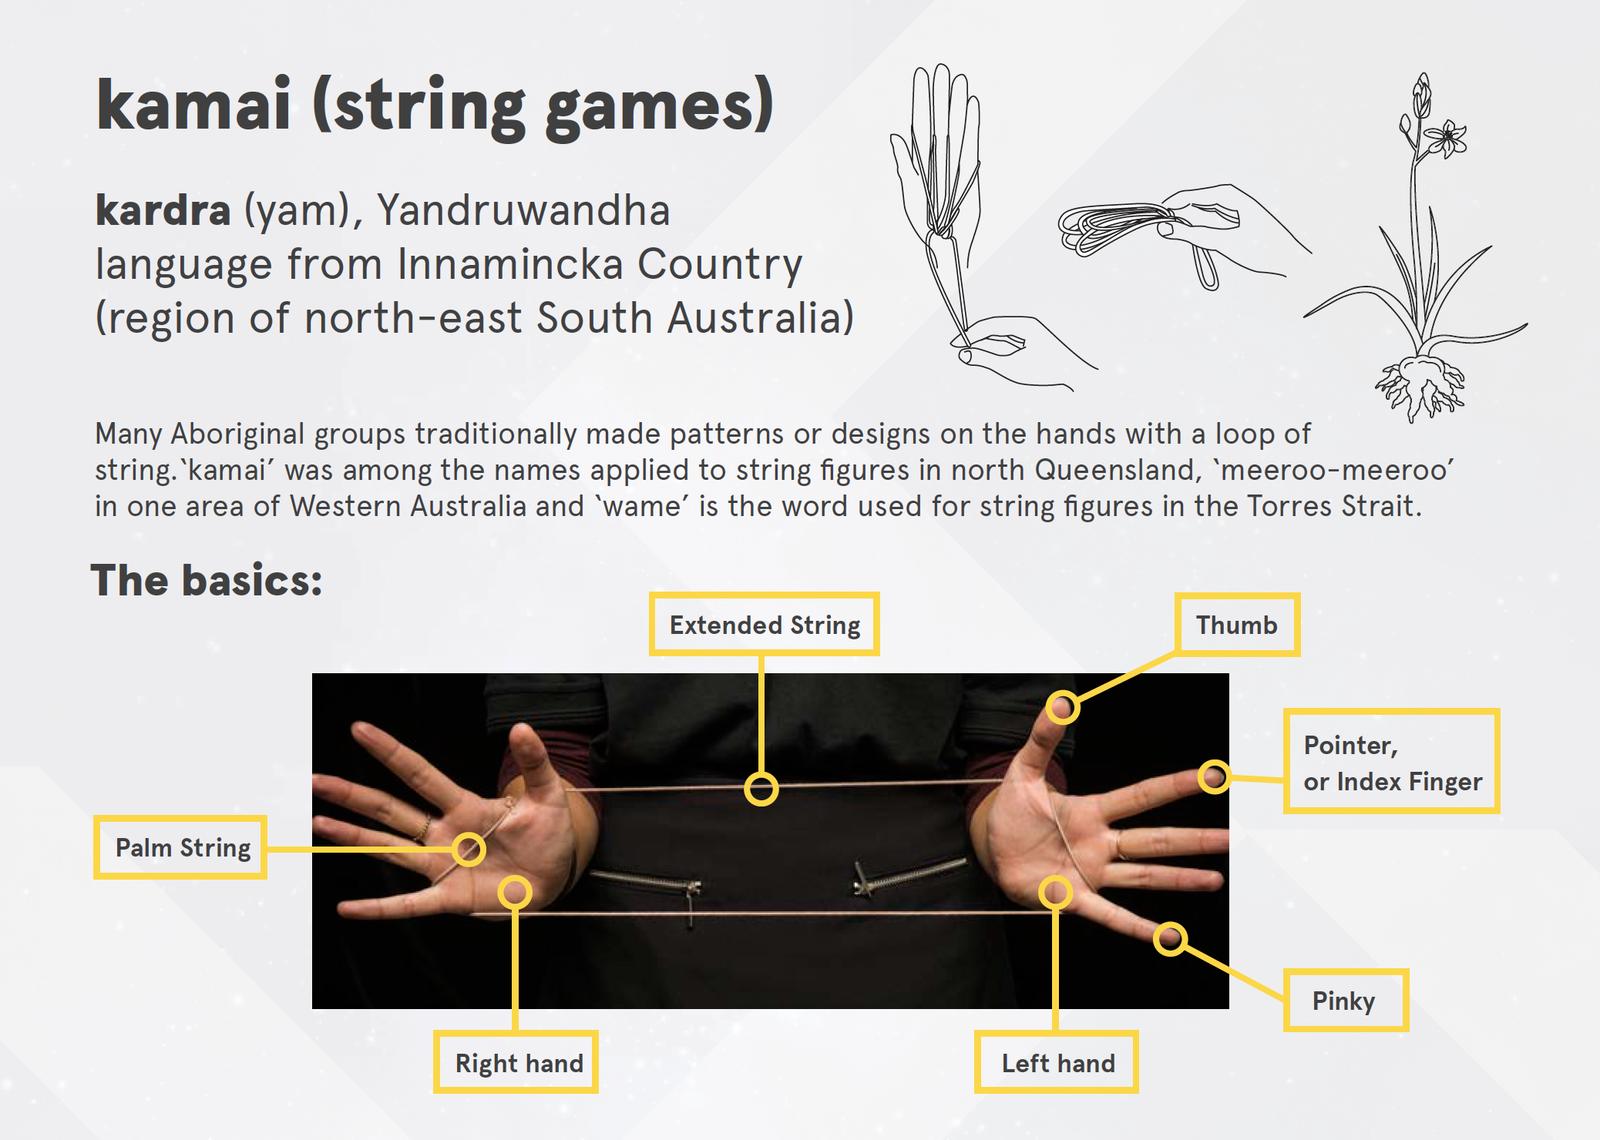 kardra (yam) string figure instructions